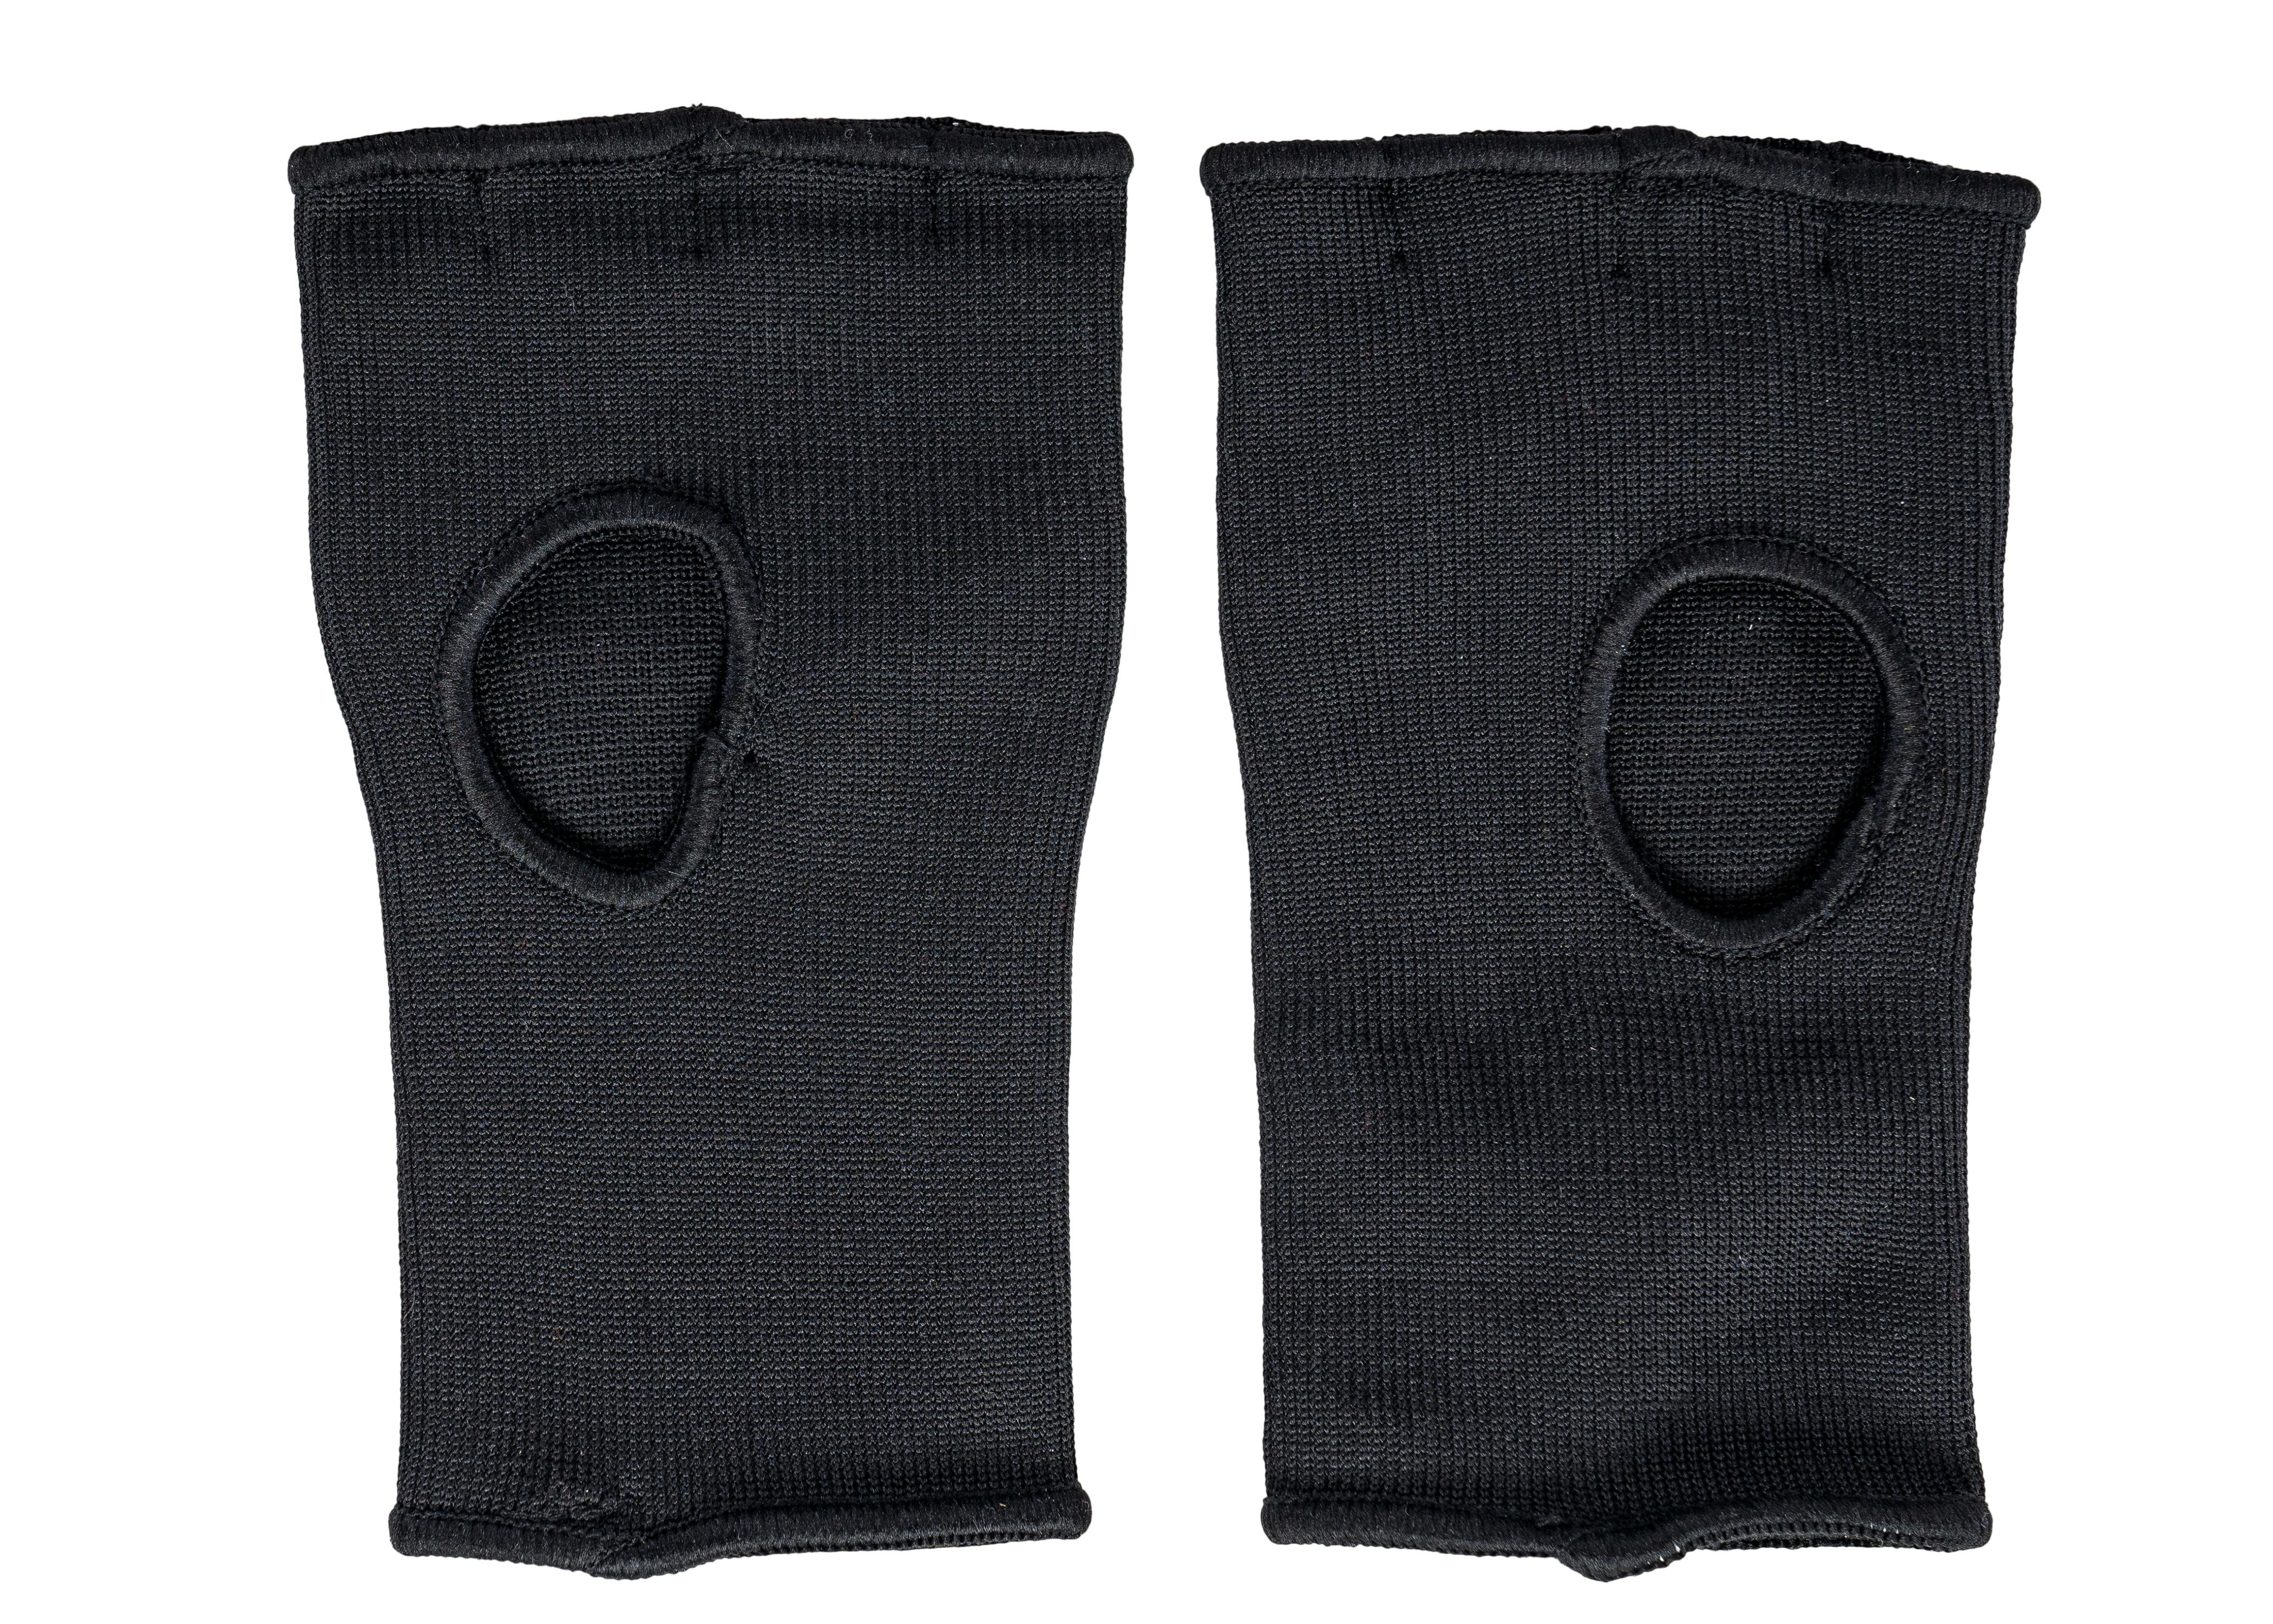 Okami Fightgear Unterhandschuh  (Größe S) (Paar)